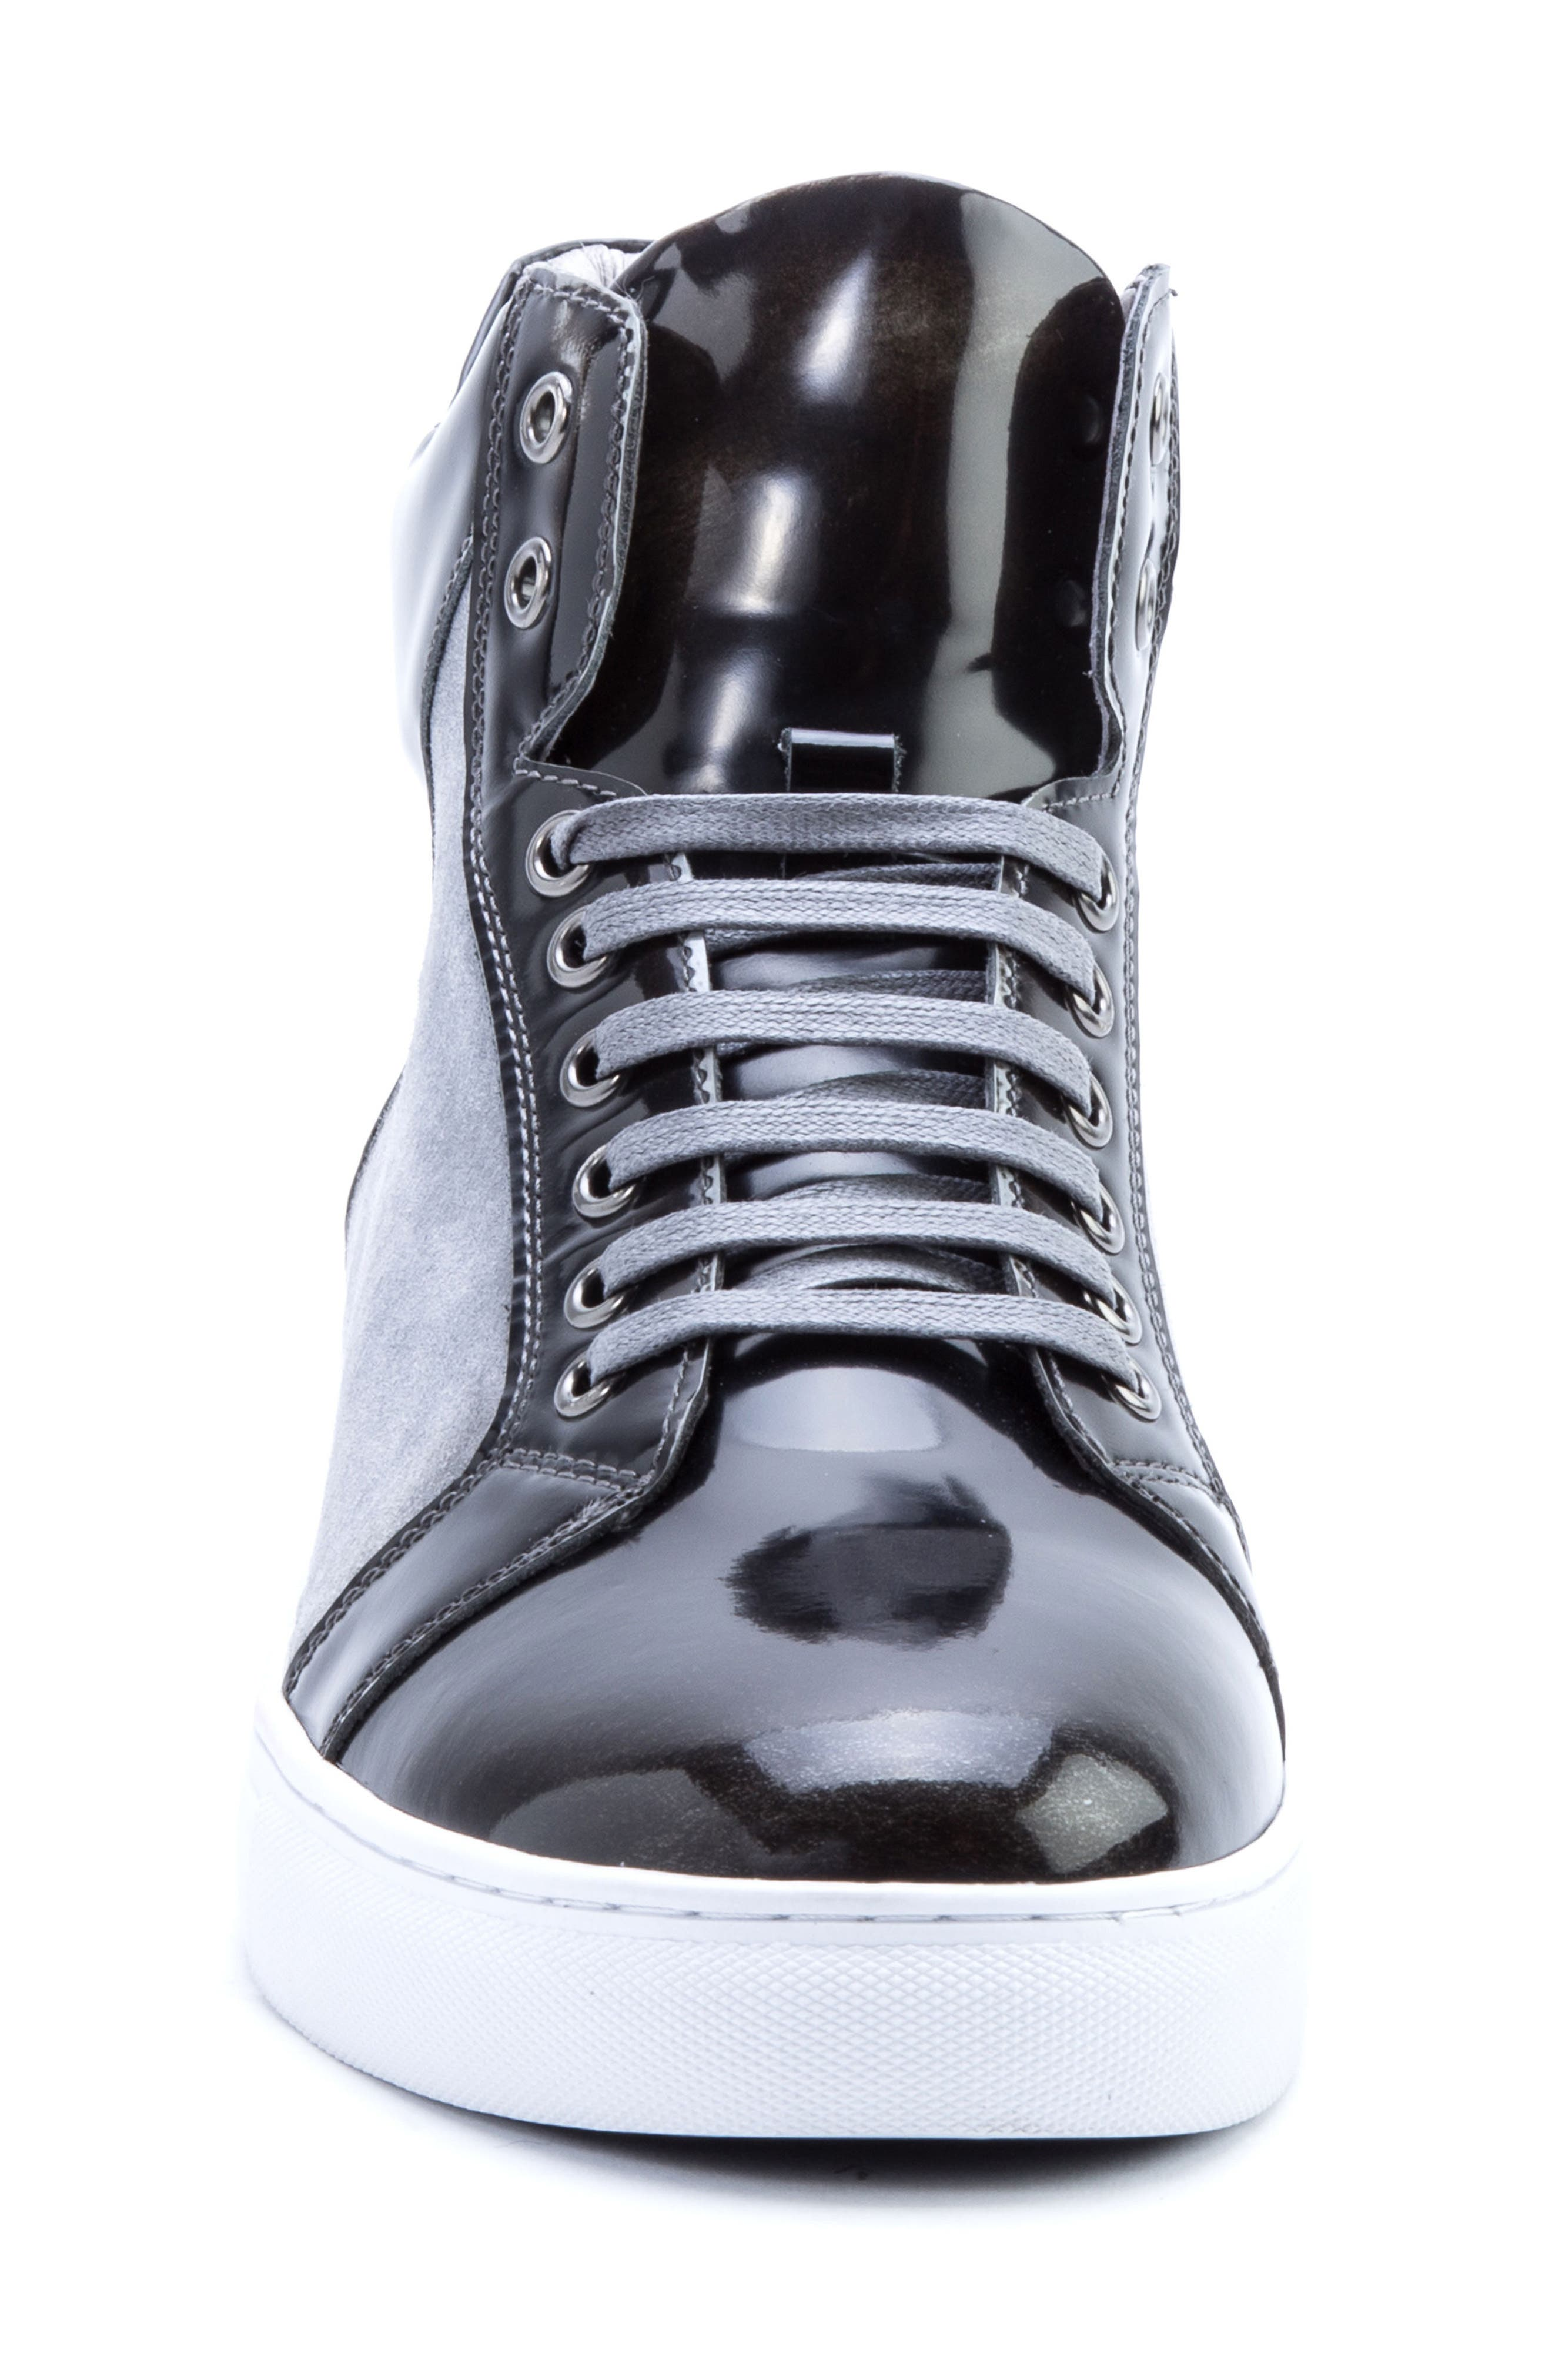 Douglas High Top Sneaker,                             Alternate thumbnail 4, color,                             BLACK LEATHER